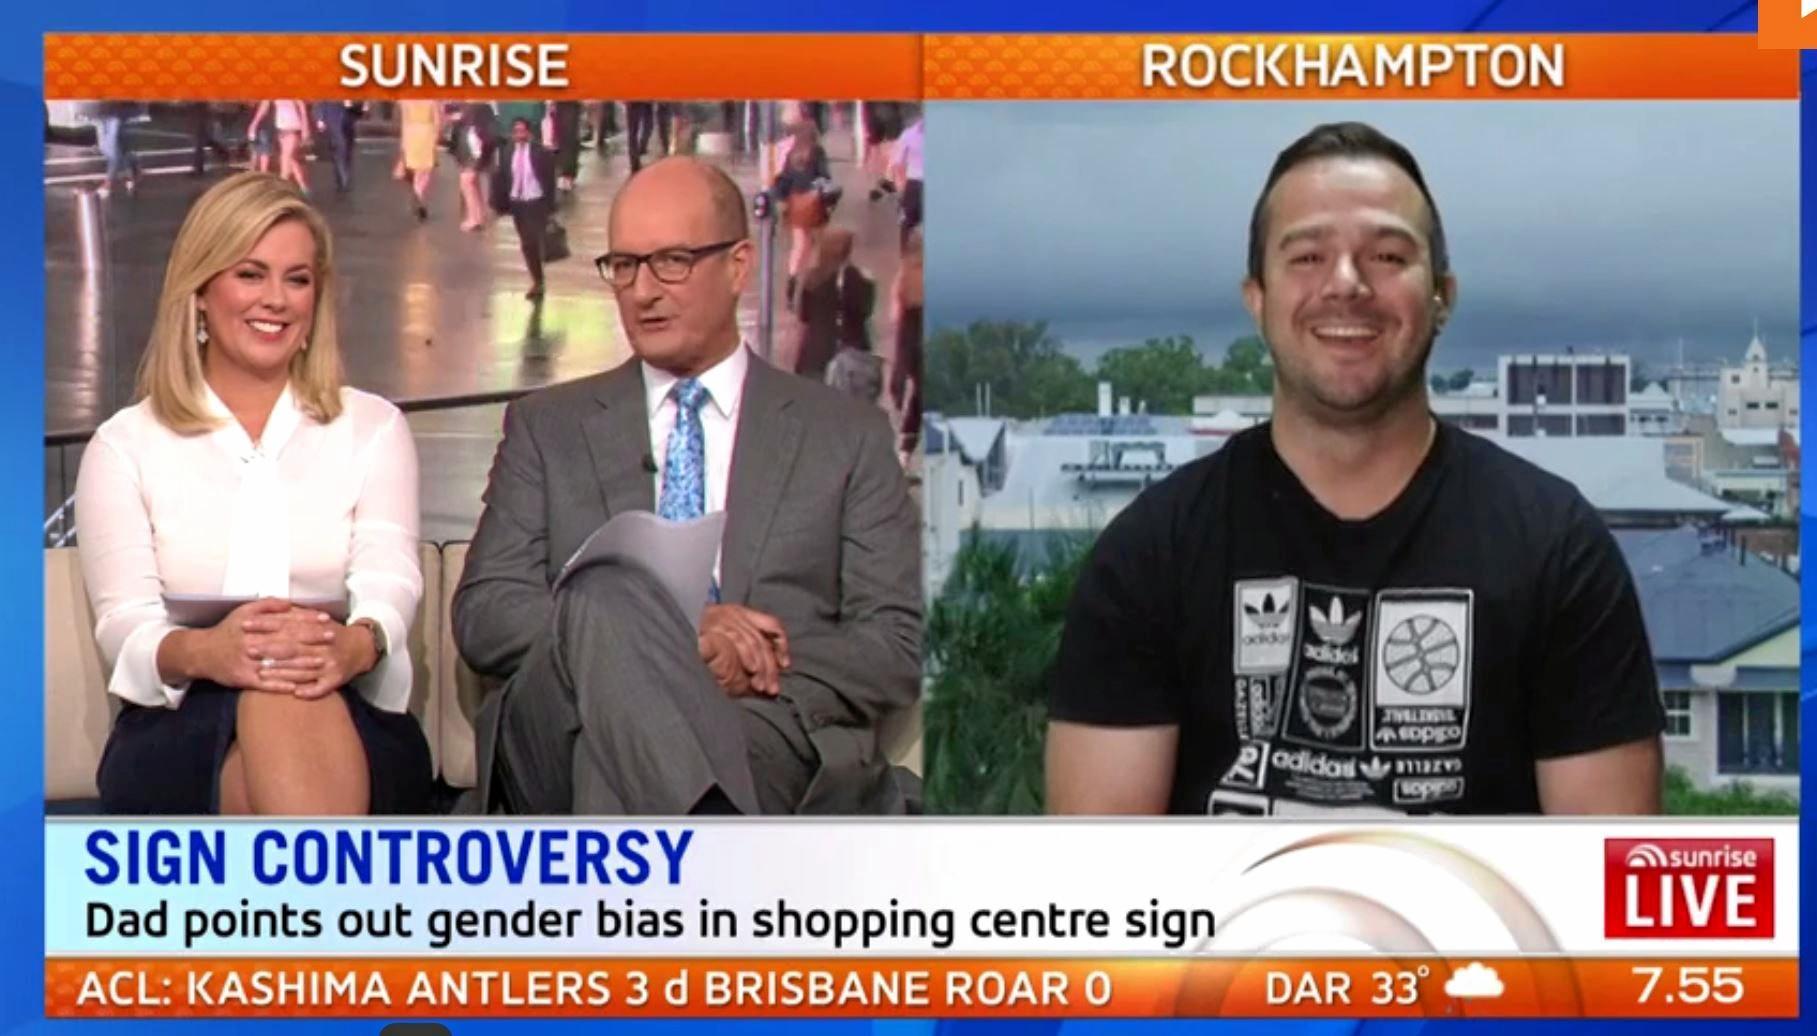 Former South Sydney Rabbitoh and Rockhampton father Jamie Simpson spoke with David